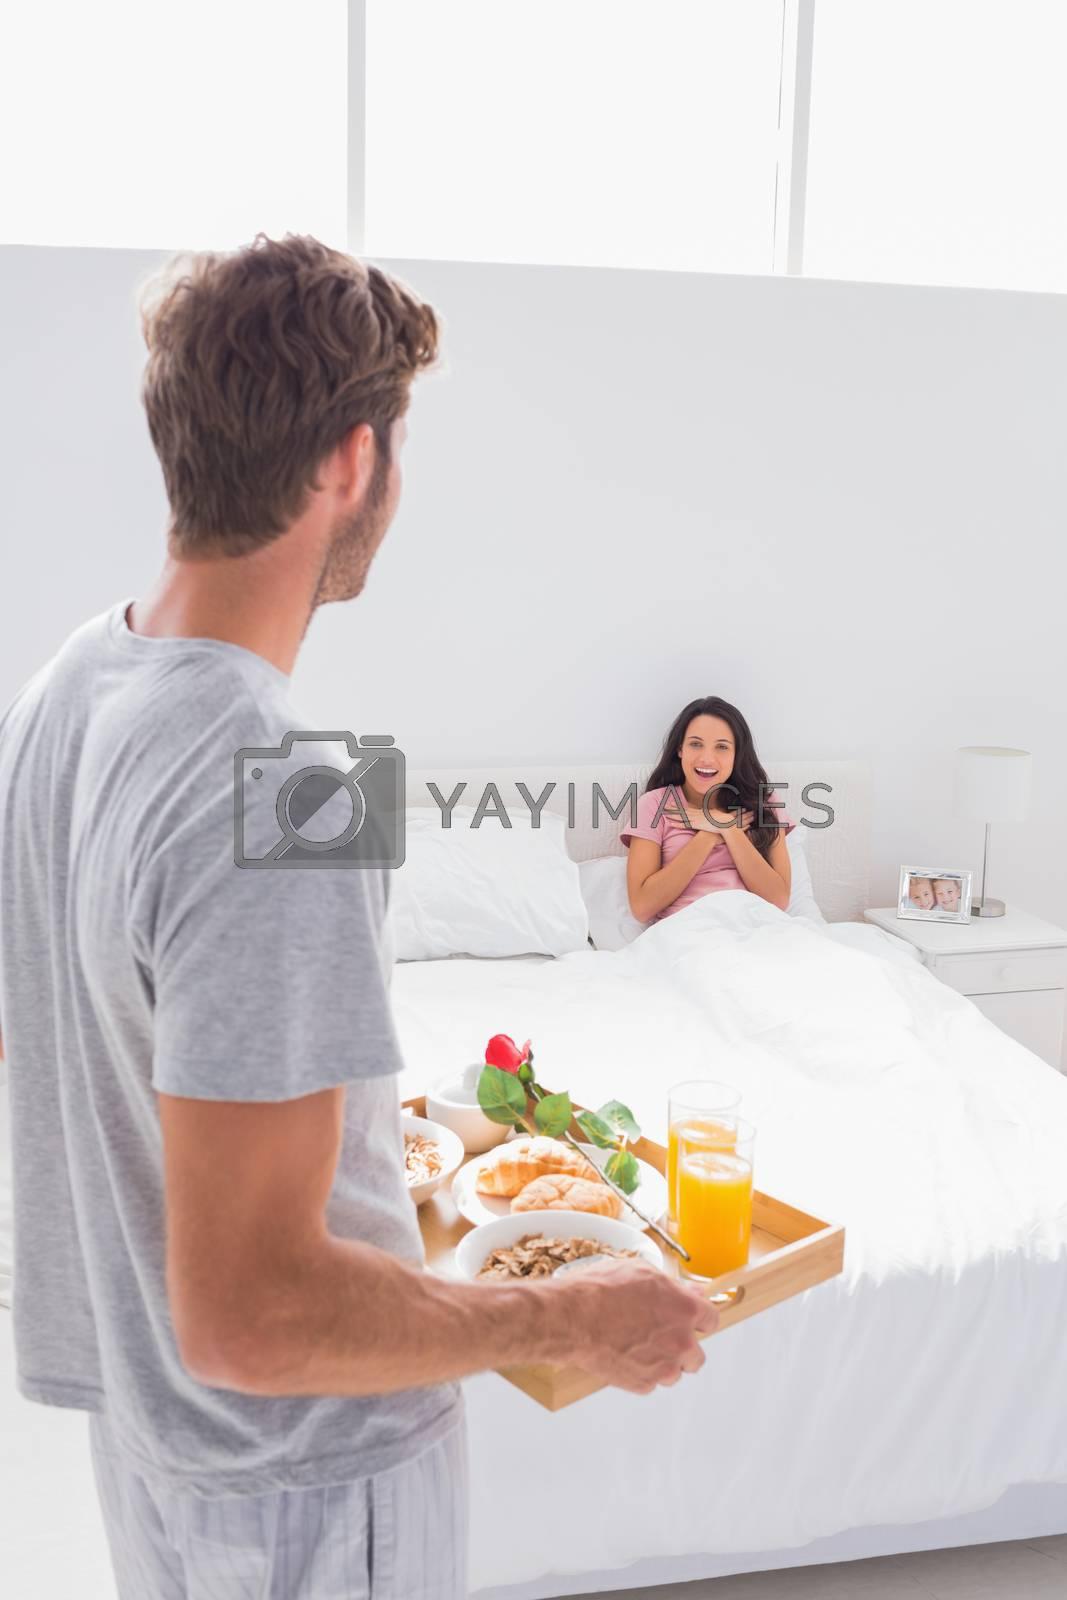 Man bringing breakfast to his surprised wife in bed